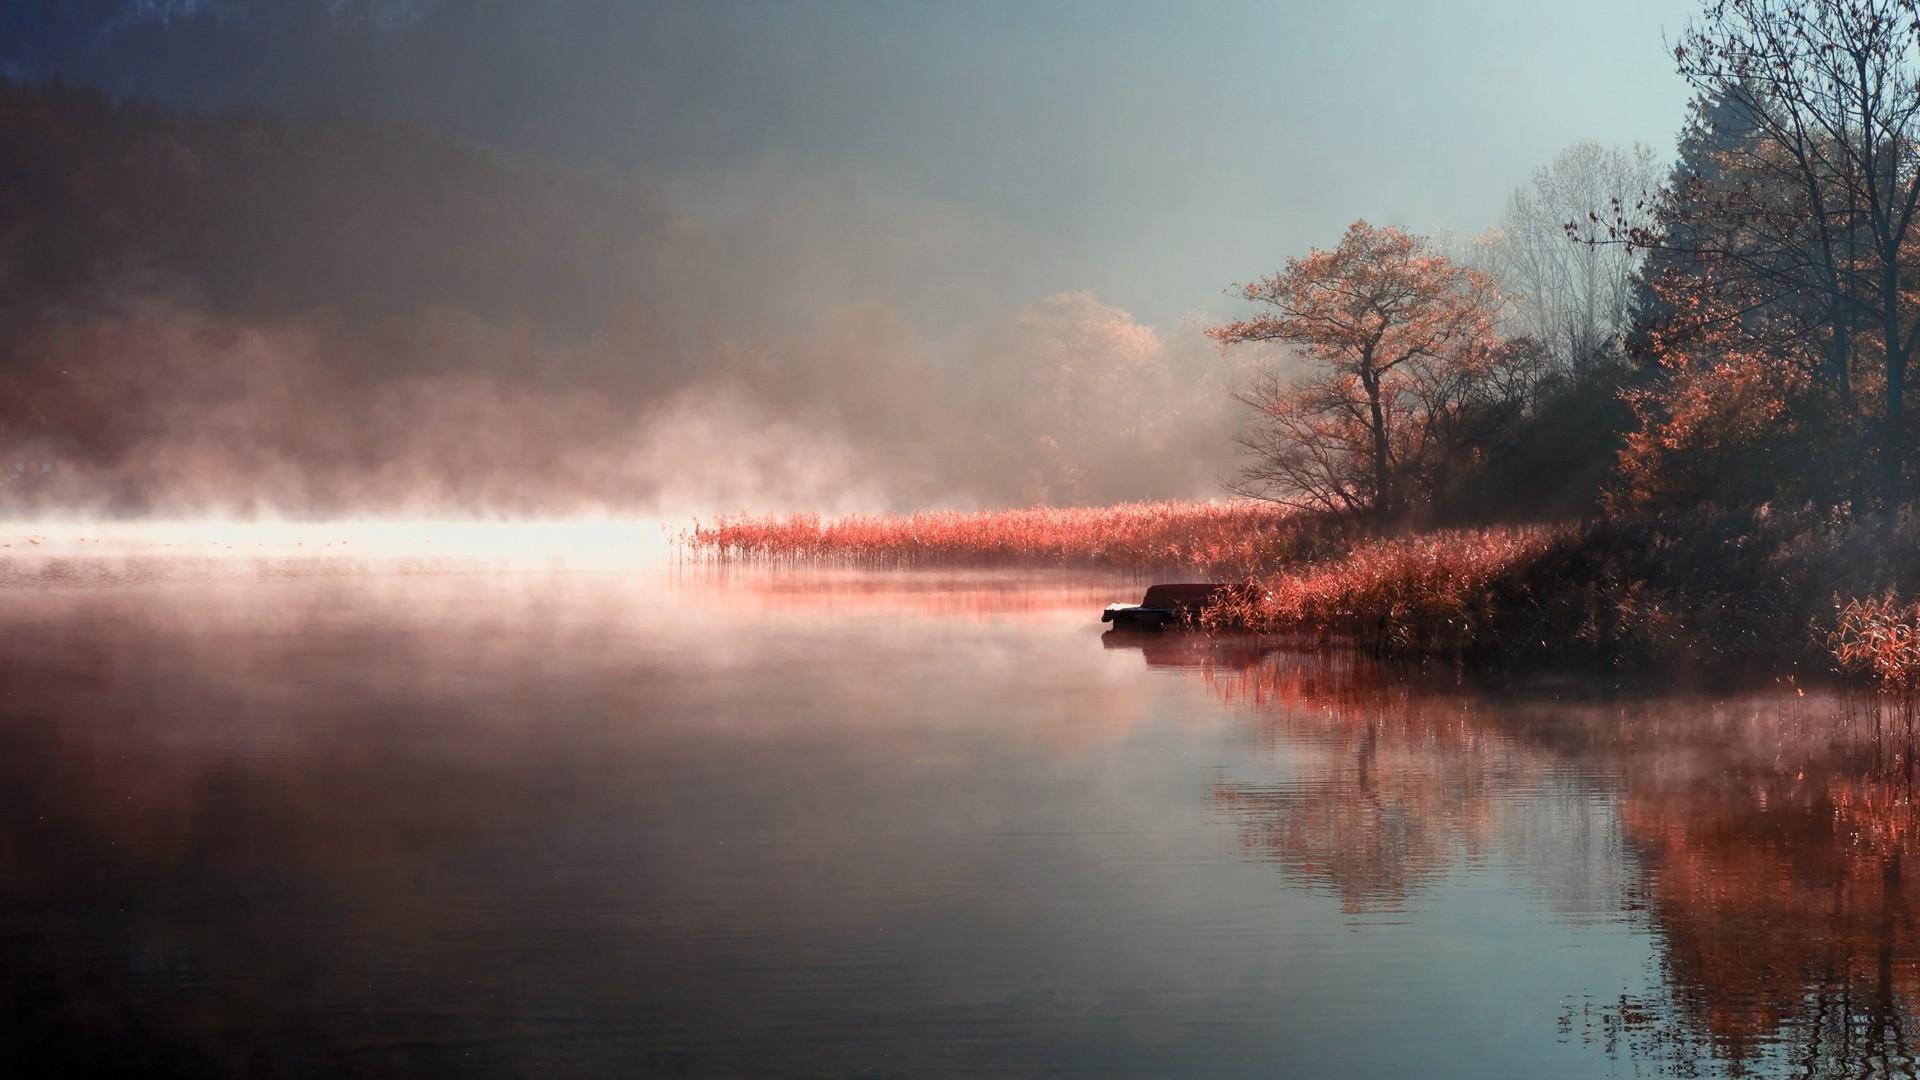 Mist Pictures